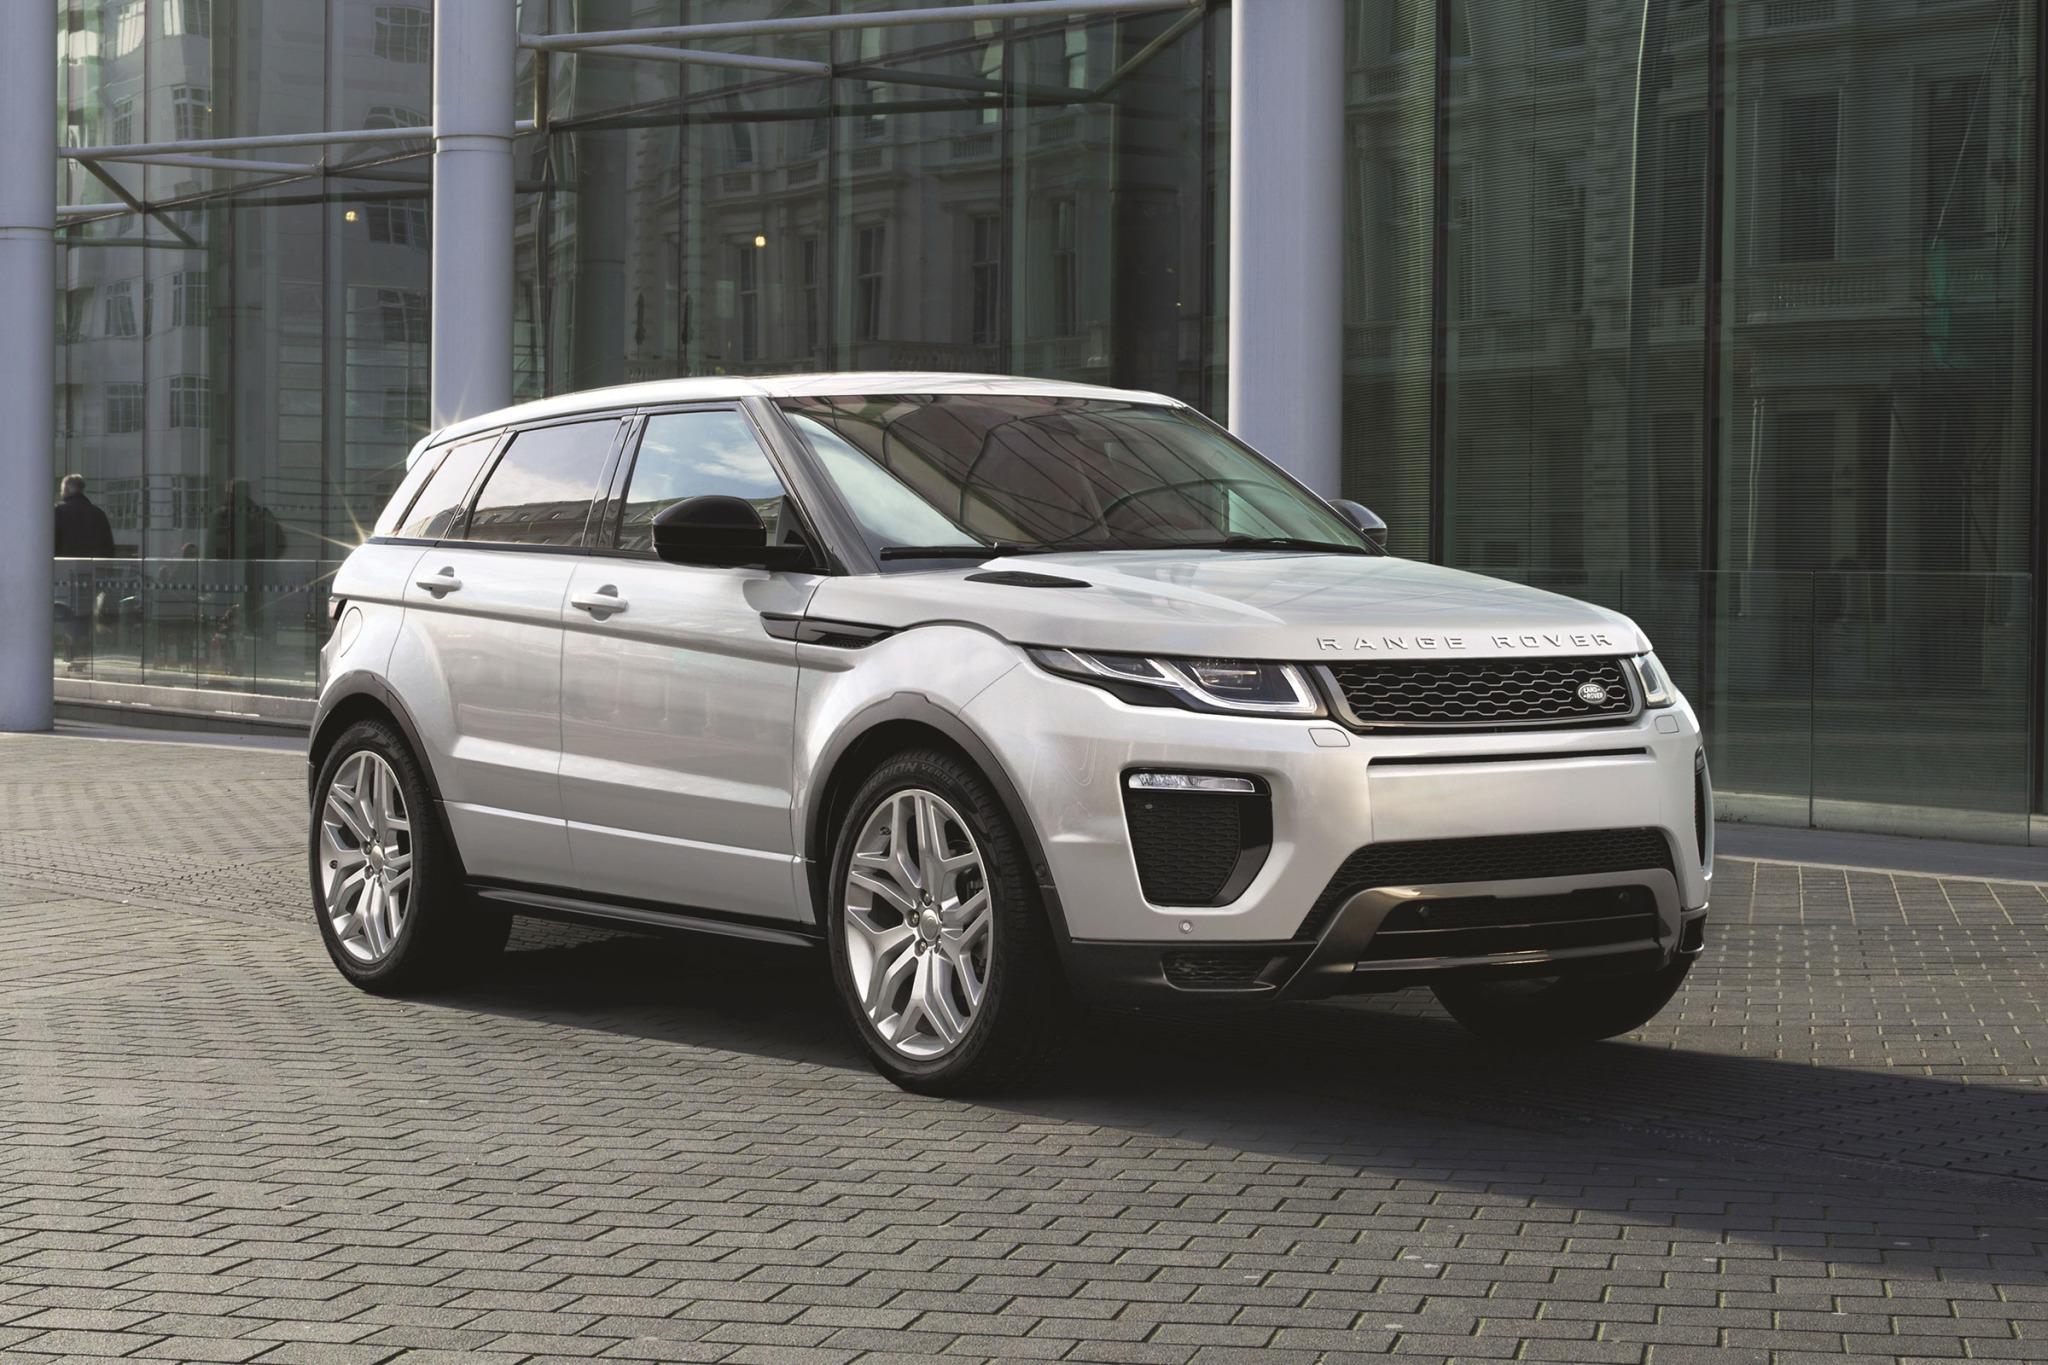 2018 land rover range rover evoque 4dr suv hse dynamic 237 hp fq oem 1 2048